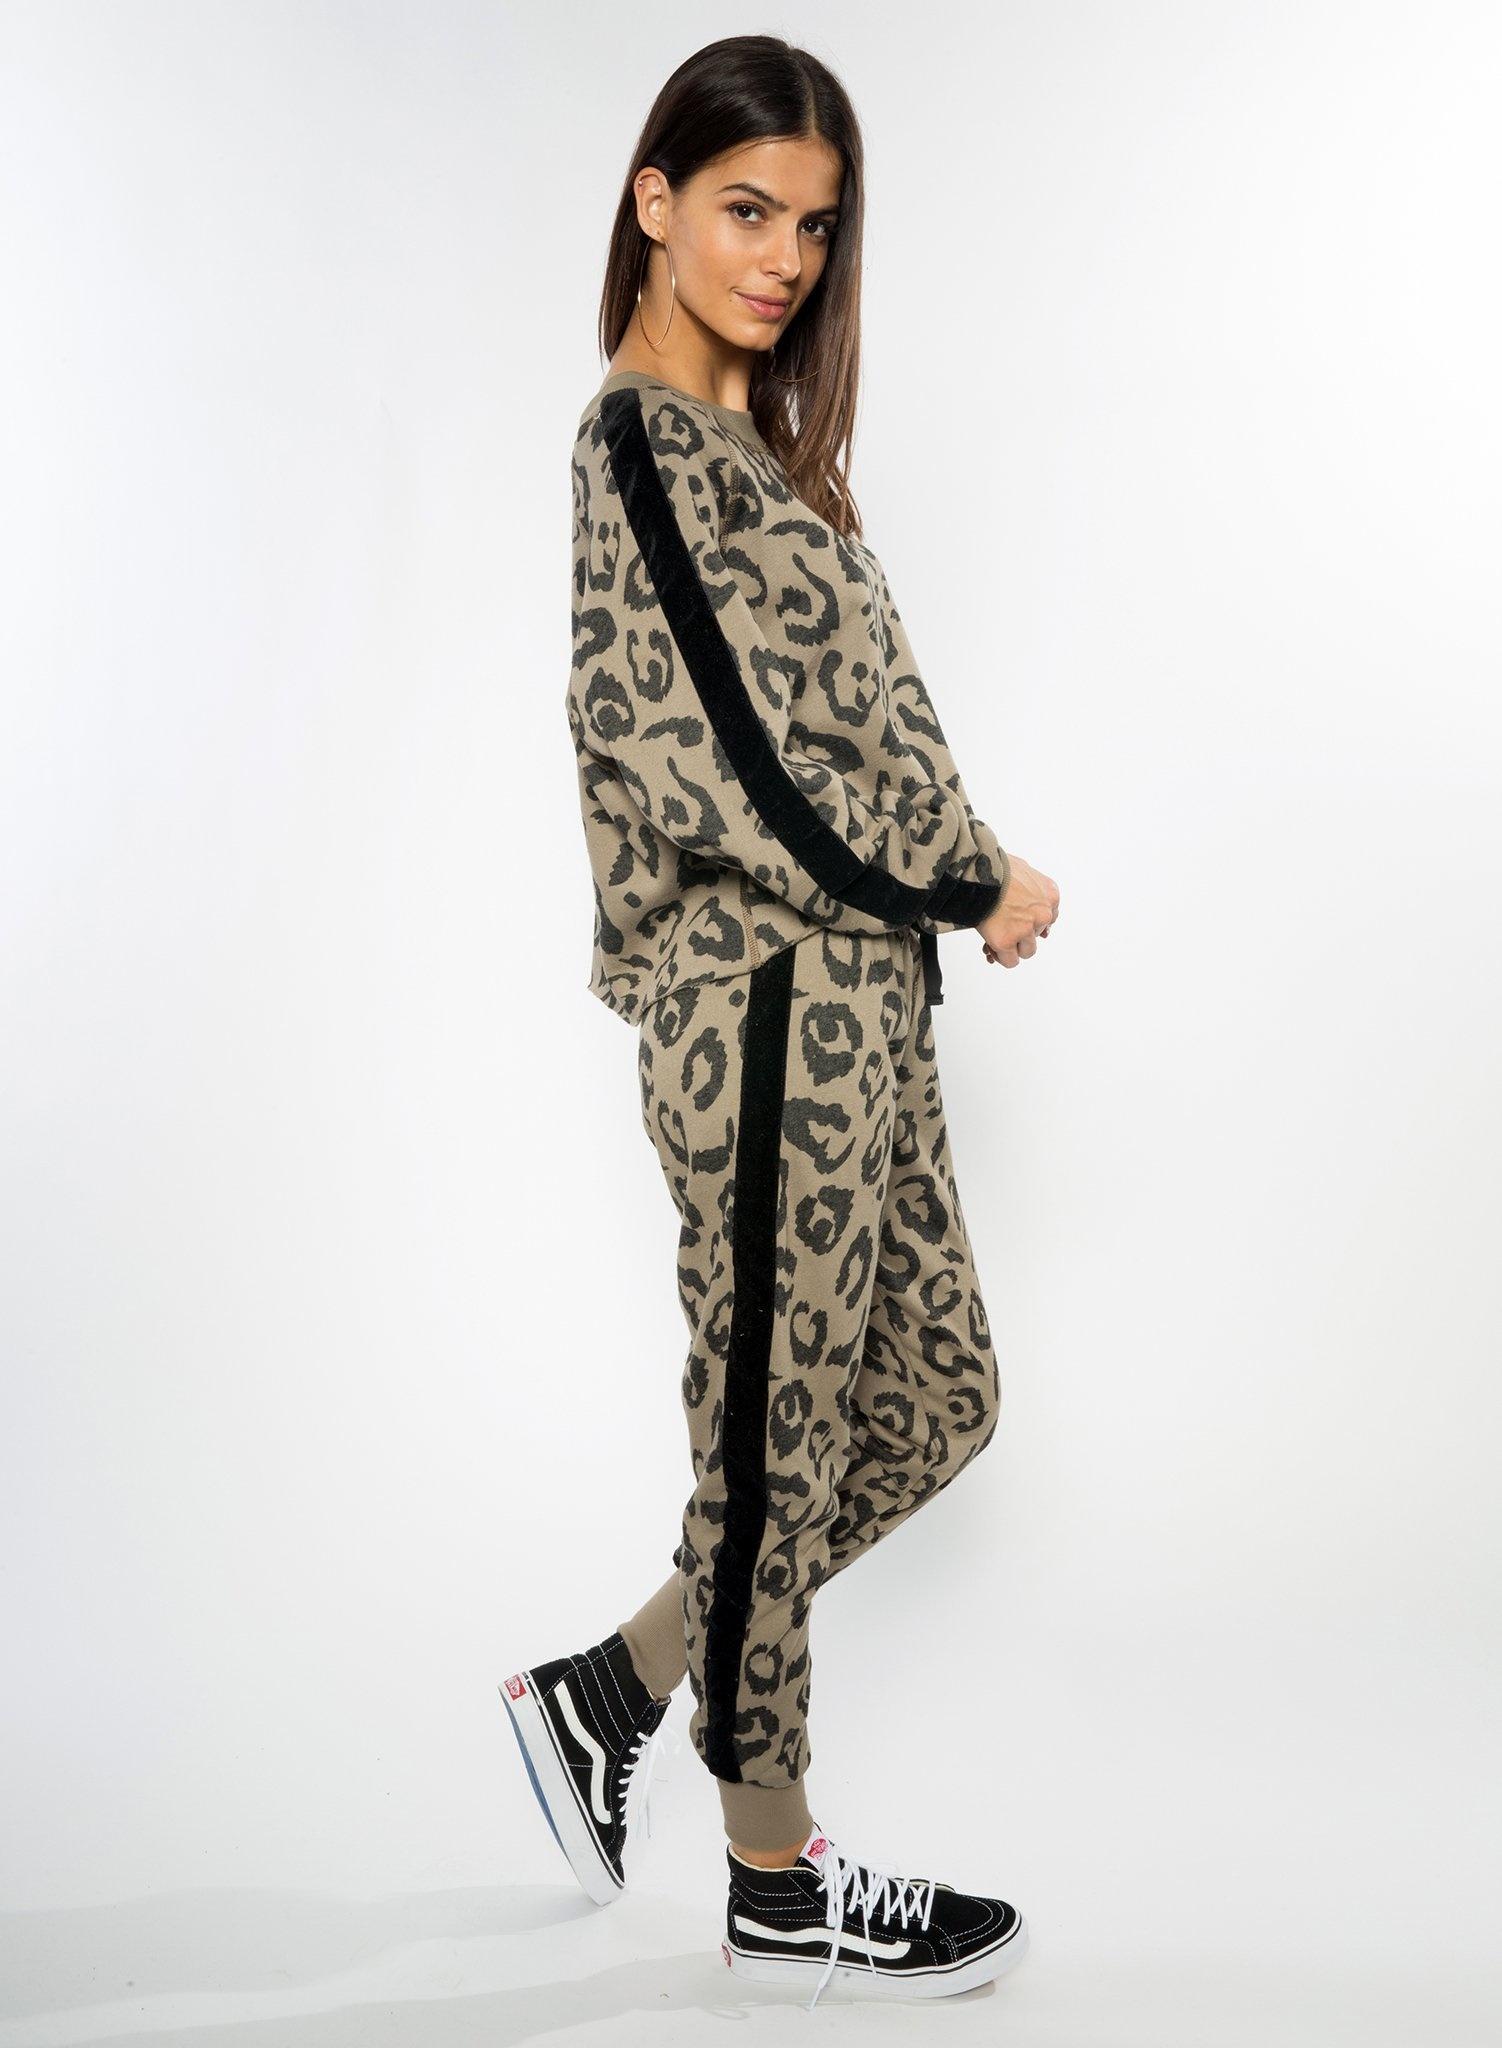 CHRLDR BIG LEOPARD — Tuxedo Crop Boatneck Sweatshirt